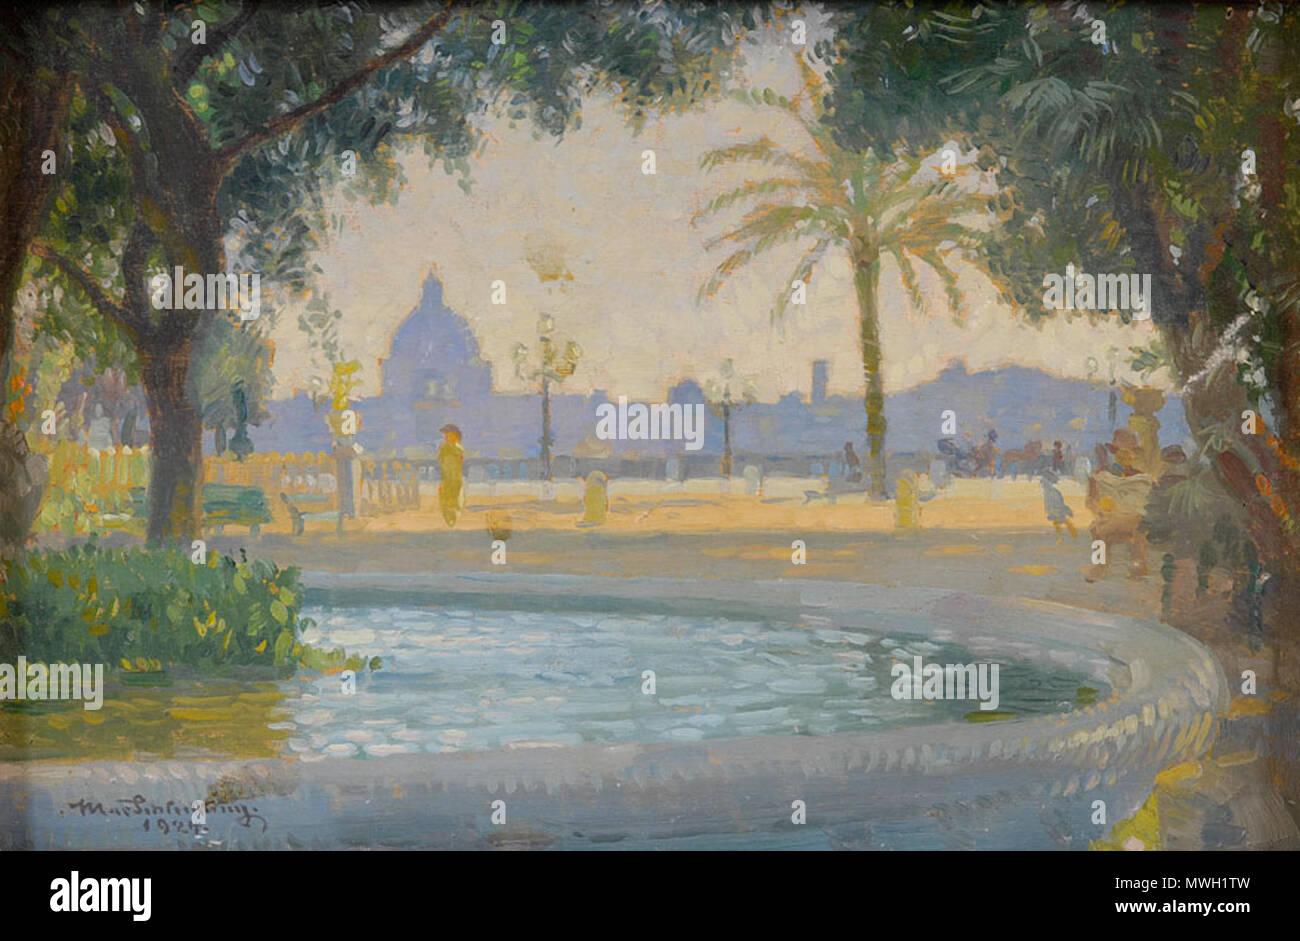 . Monte Pincio, Roma, Öl auf Holz, 15,5 x 23,5 cm . 19th/20th century. Max Schlichting (1866–1937) 408 Max Schlichting Monte Pincio - Stock Image